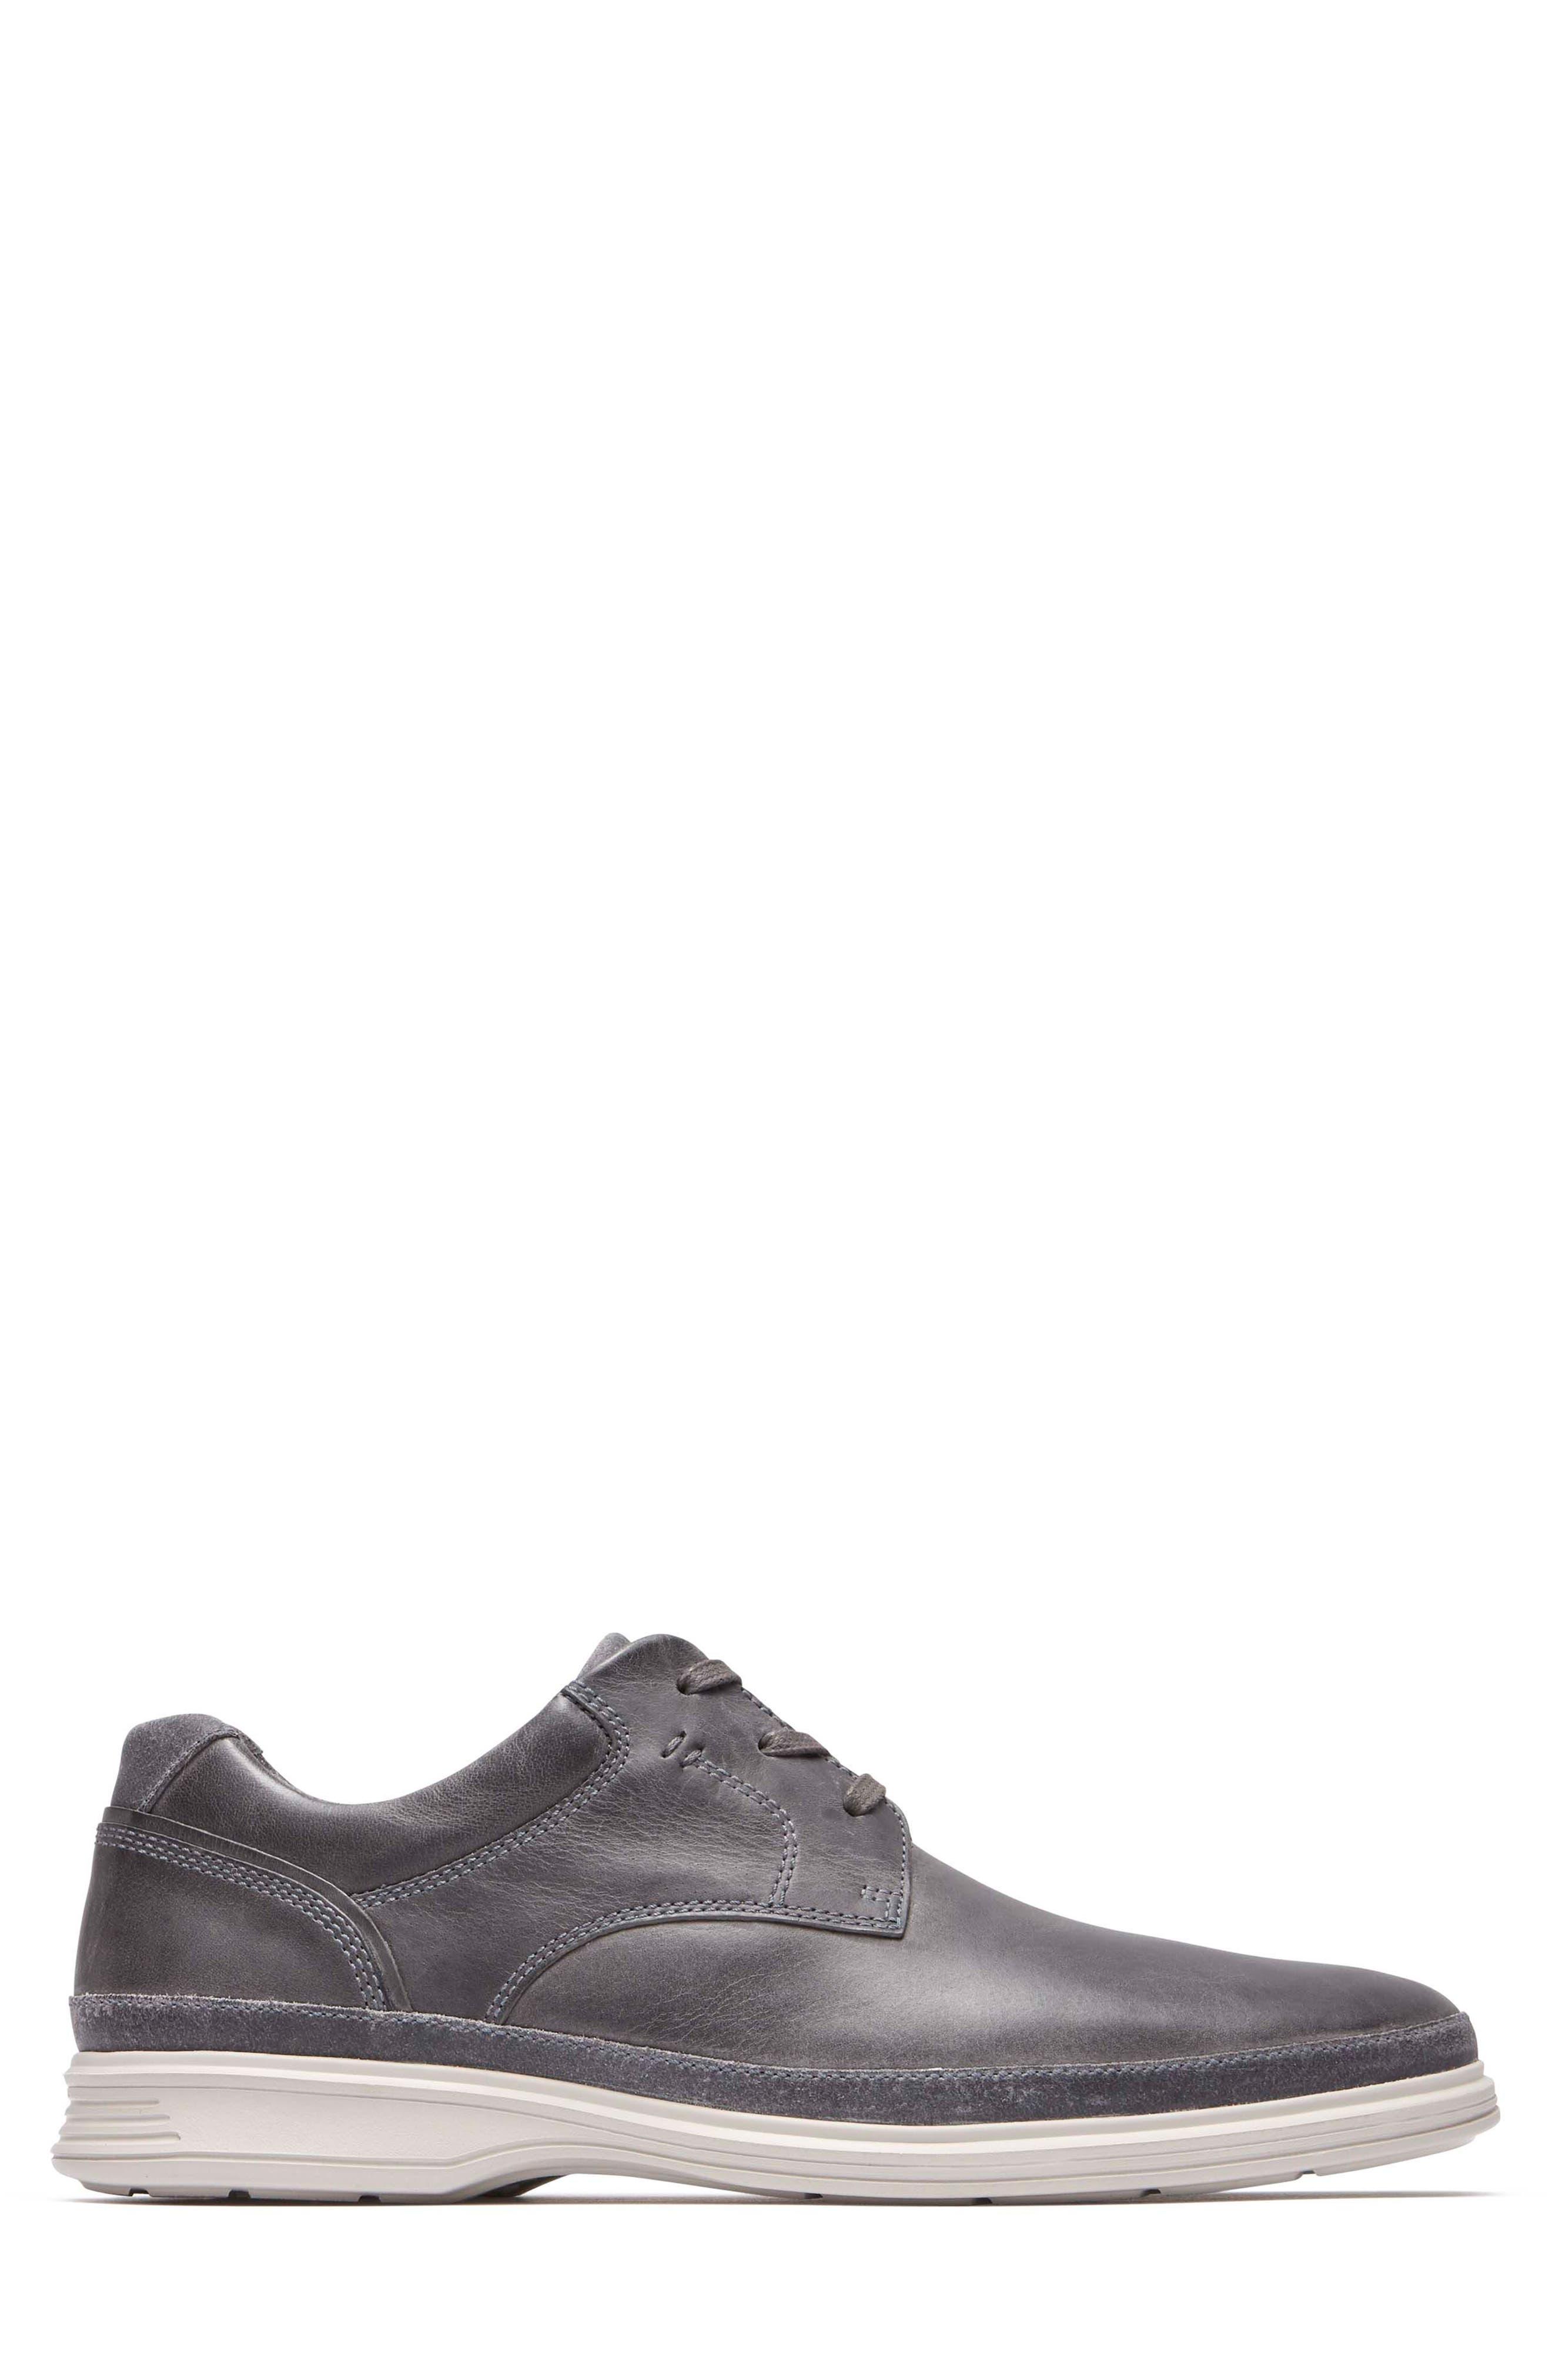 Dressports 2 Go Plain Toe Derby,                             Alternate thumbnail 3, color,                             Grey Leather